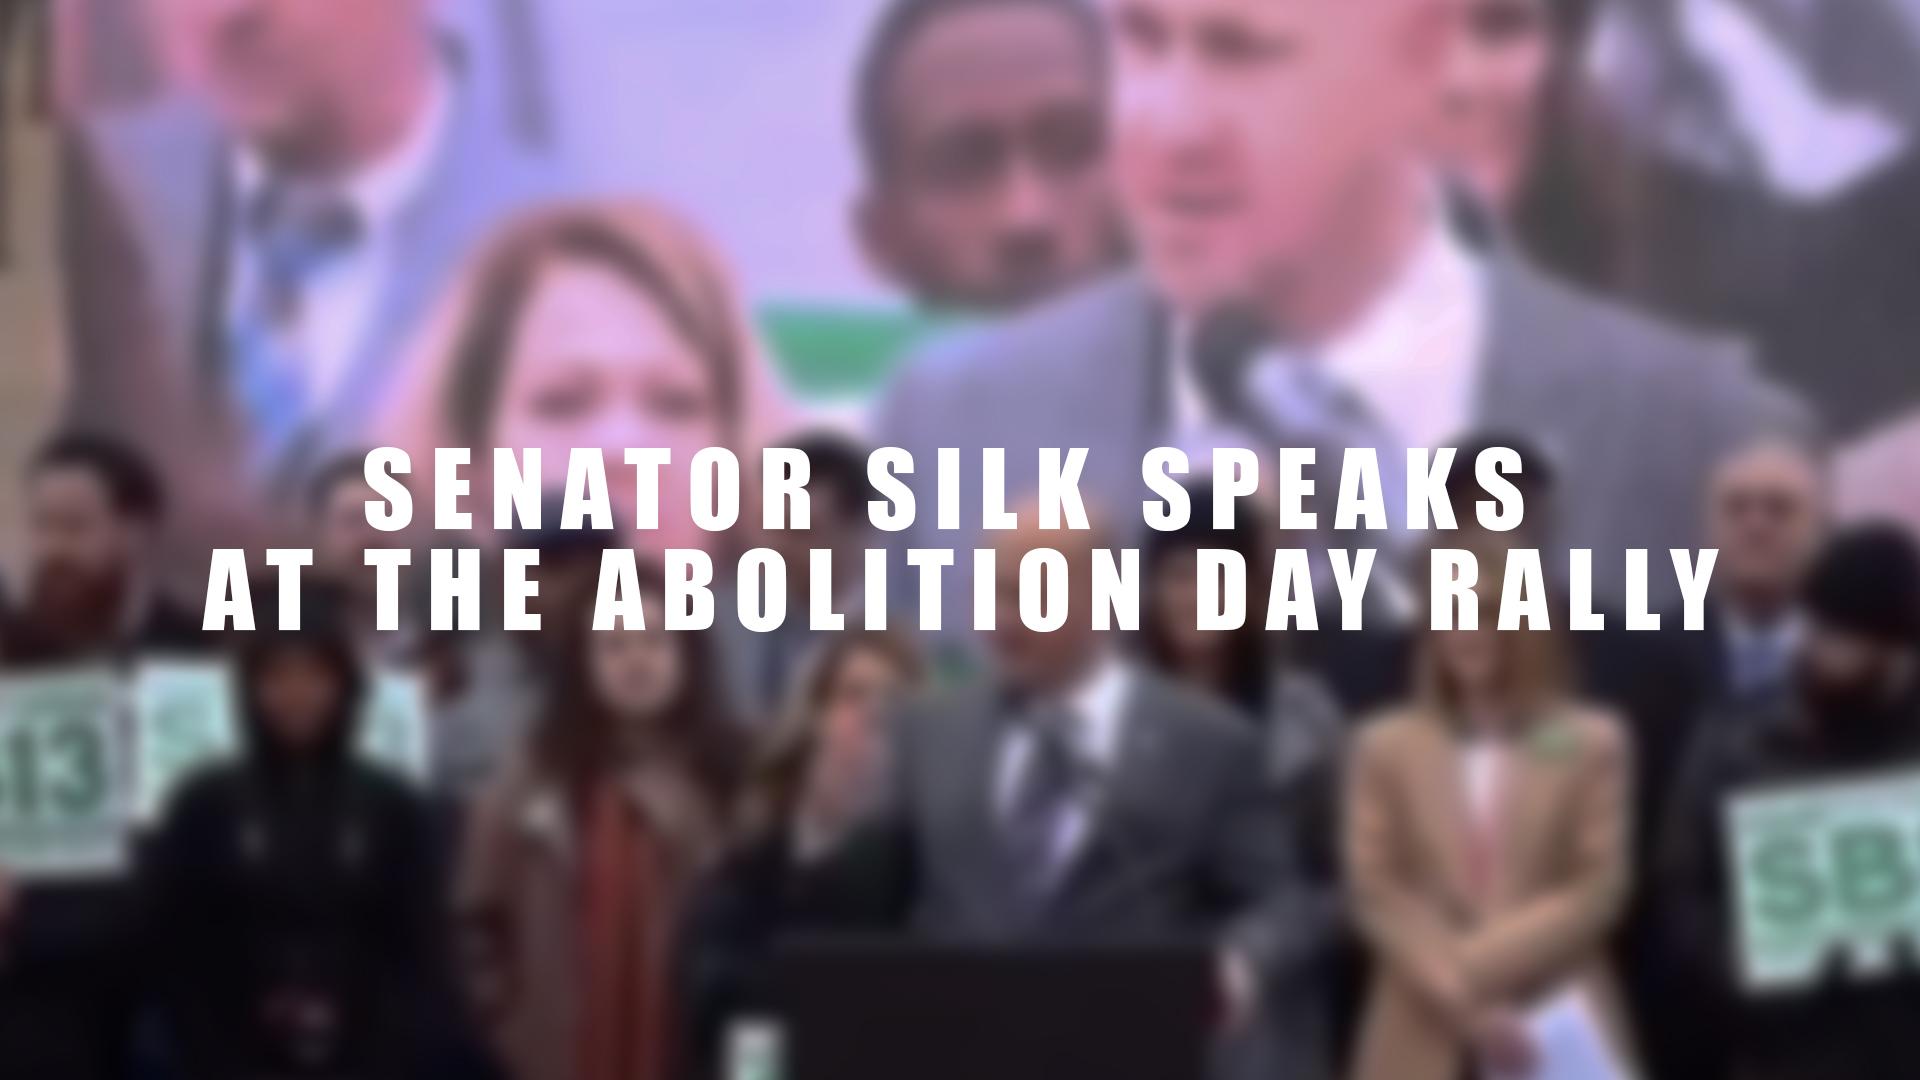 Senator Silk Speaks at the Abolition Day Rally